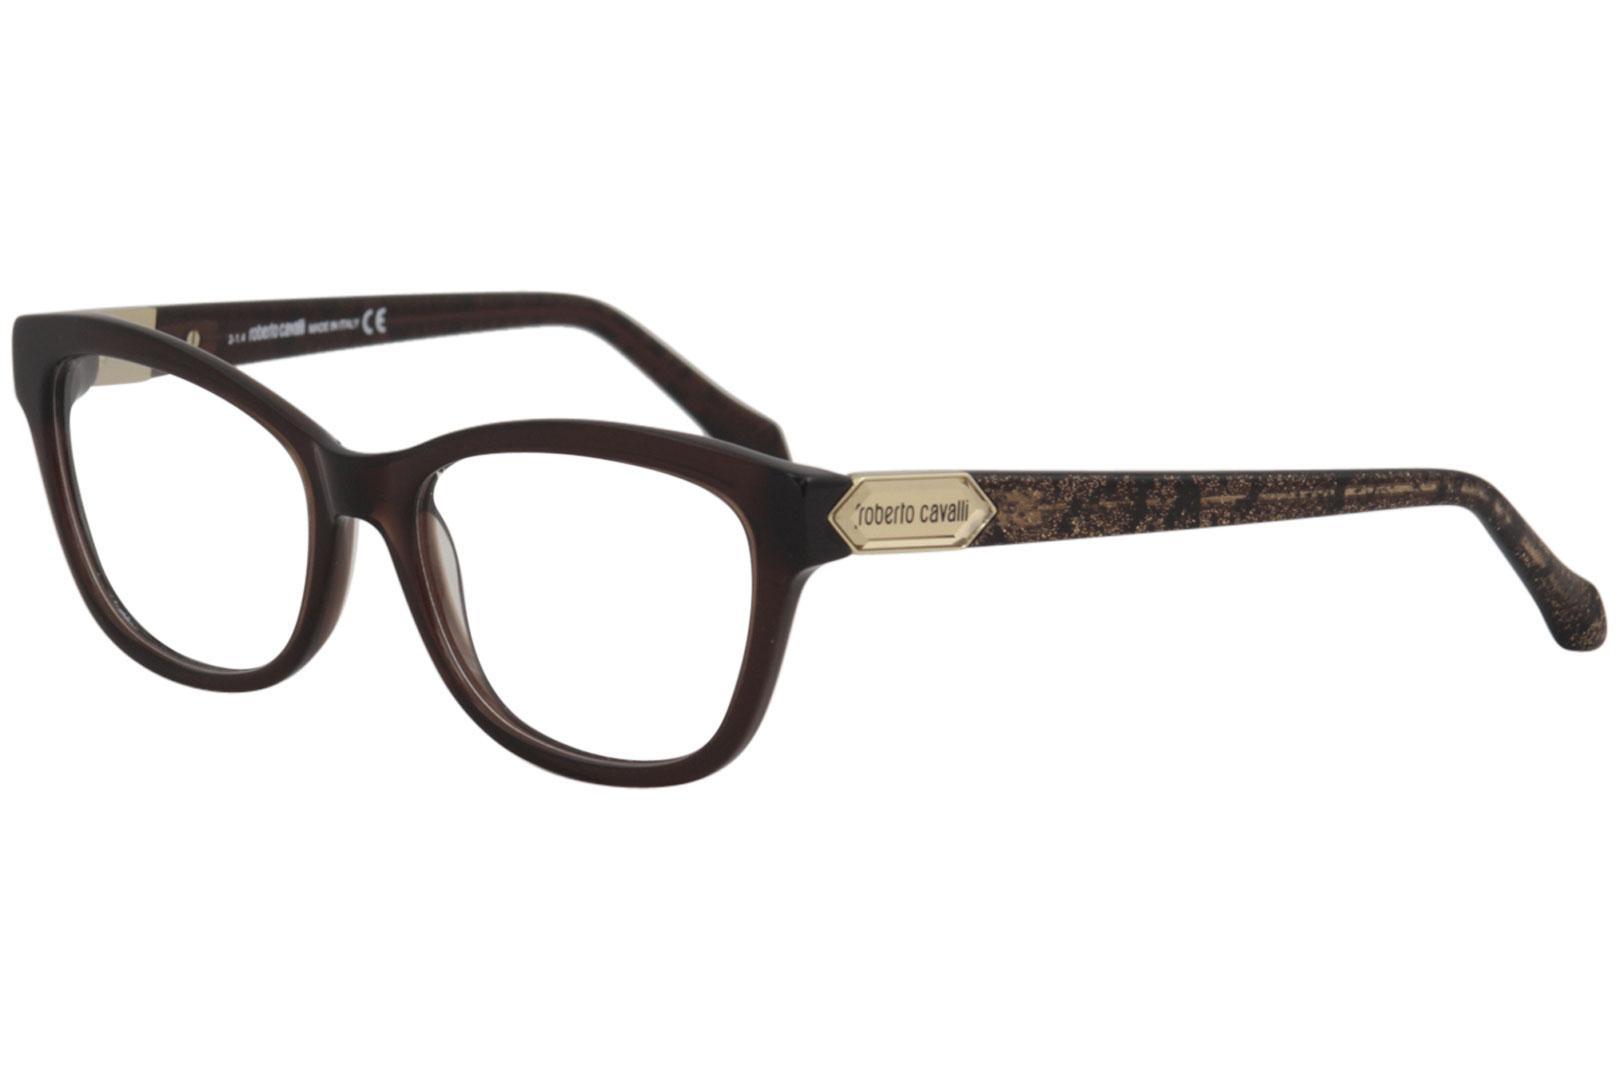 9f79d140761 Roberto Cavalli Women s Eyeglasses Algorab 810 Full Rim Optical Frame